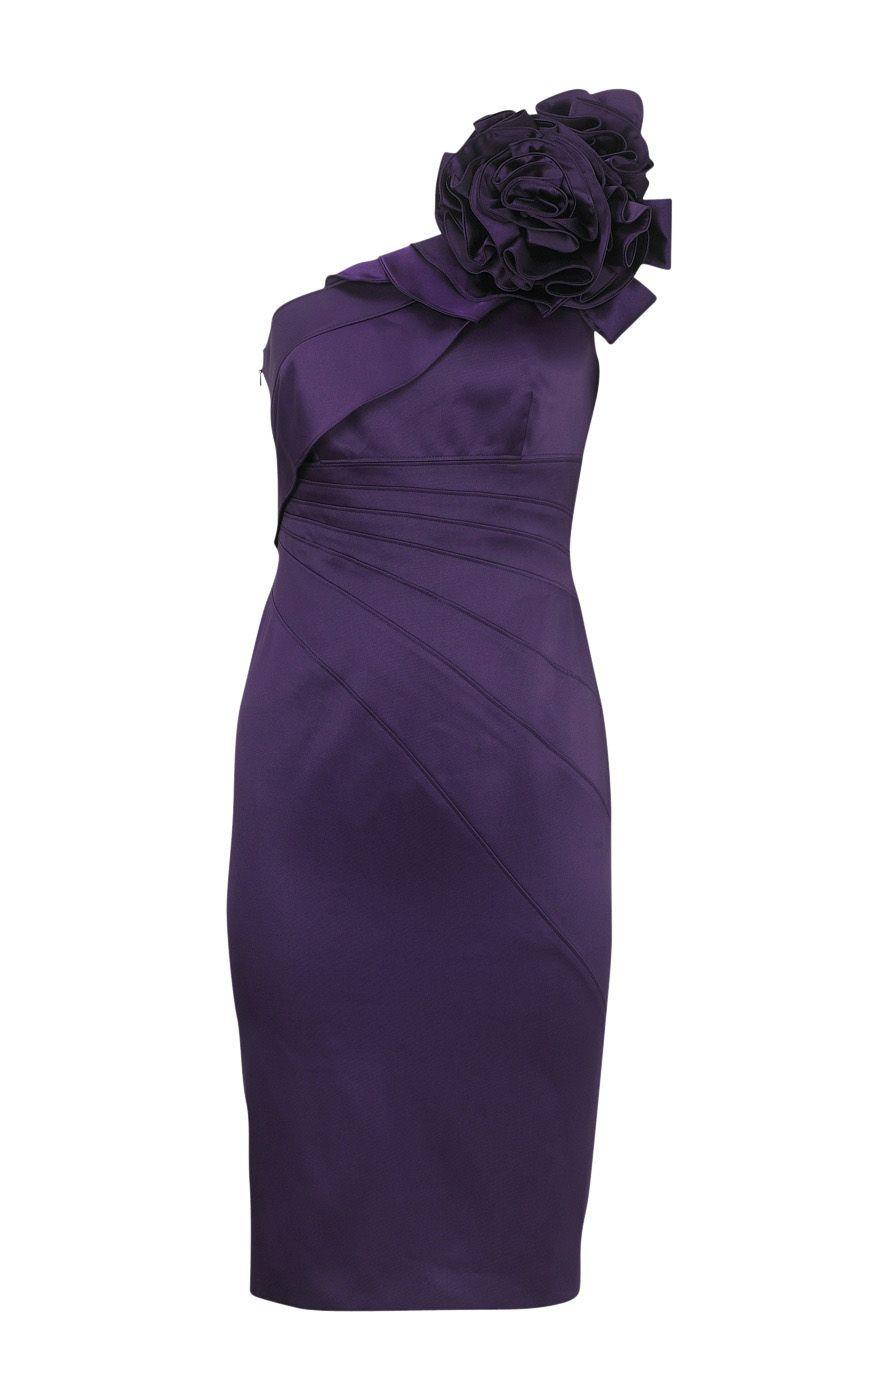 Sexy Purple Bridesmaid Dress | My sisters wedding | Pinterest